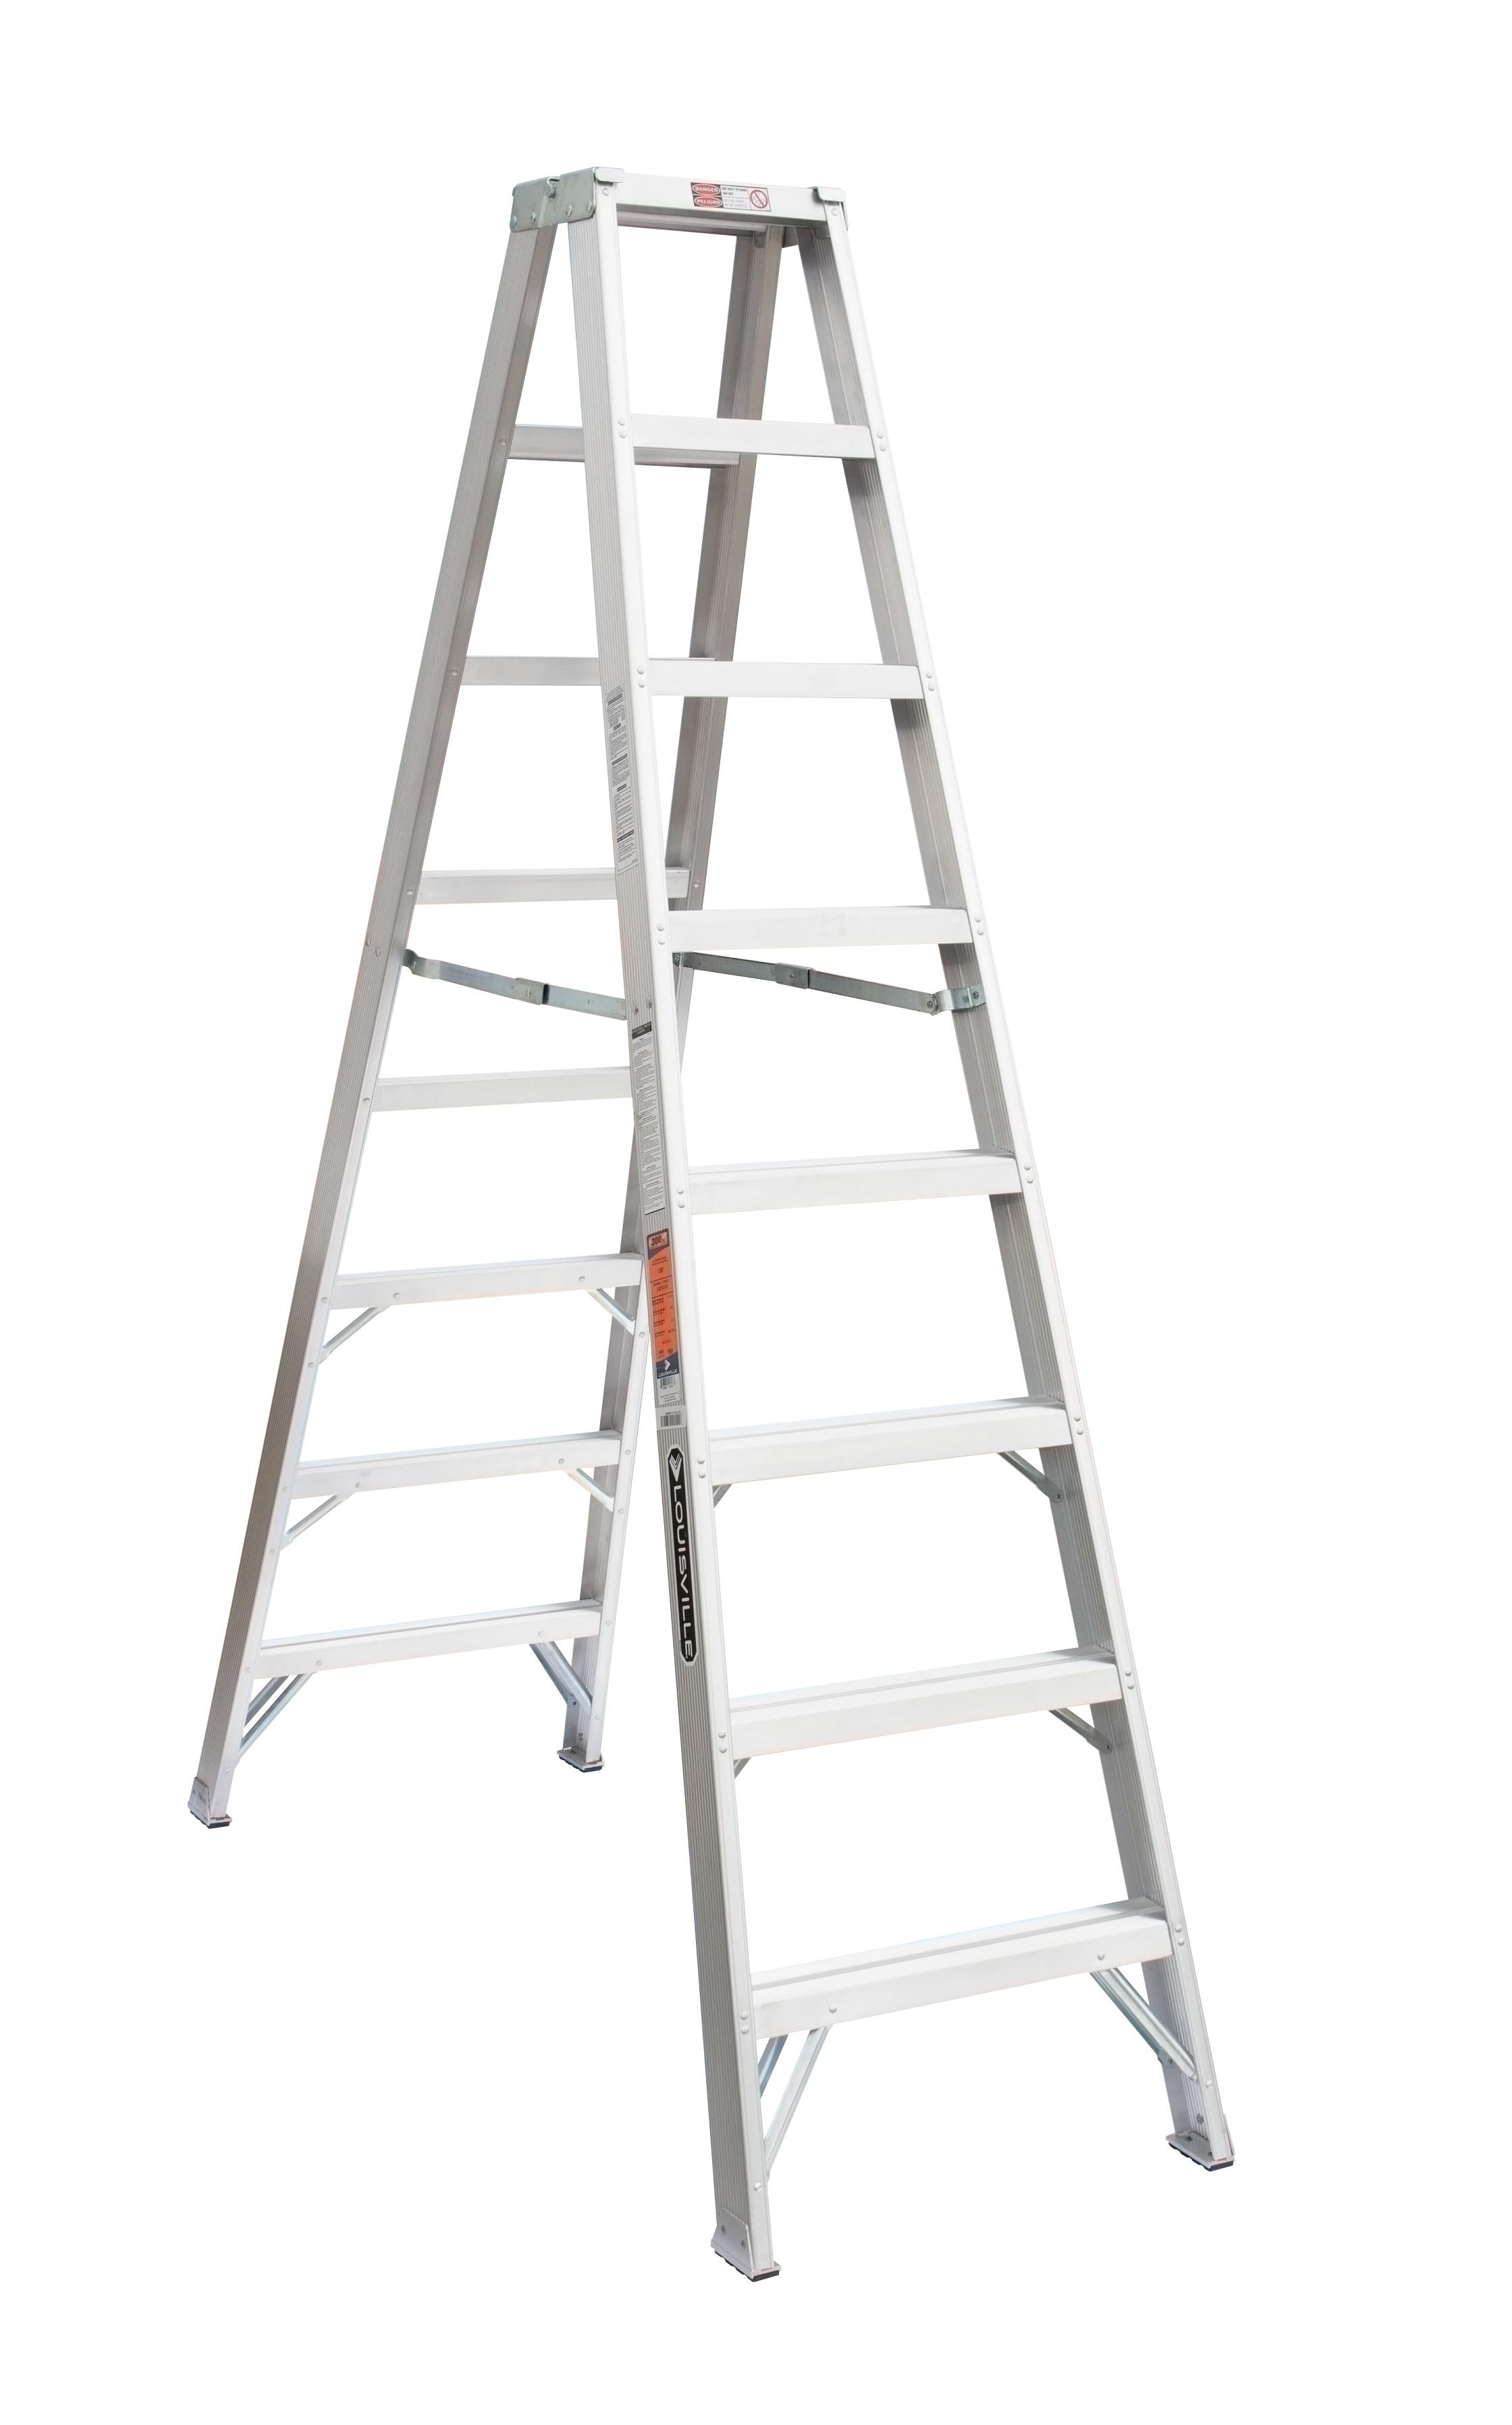 Louisville Ladder AM1008 8 Foot 300 lb Duty Rating Aluminum Twin Front Step Ladder